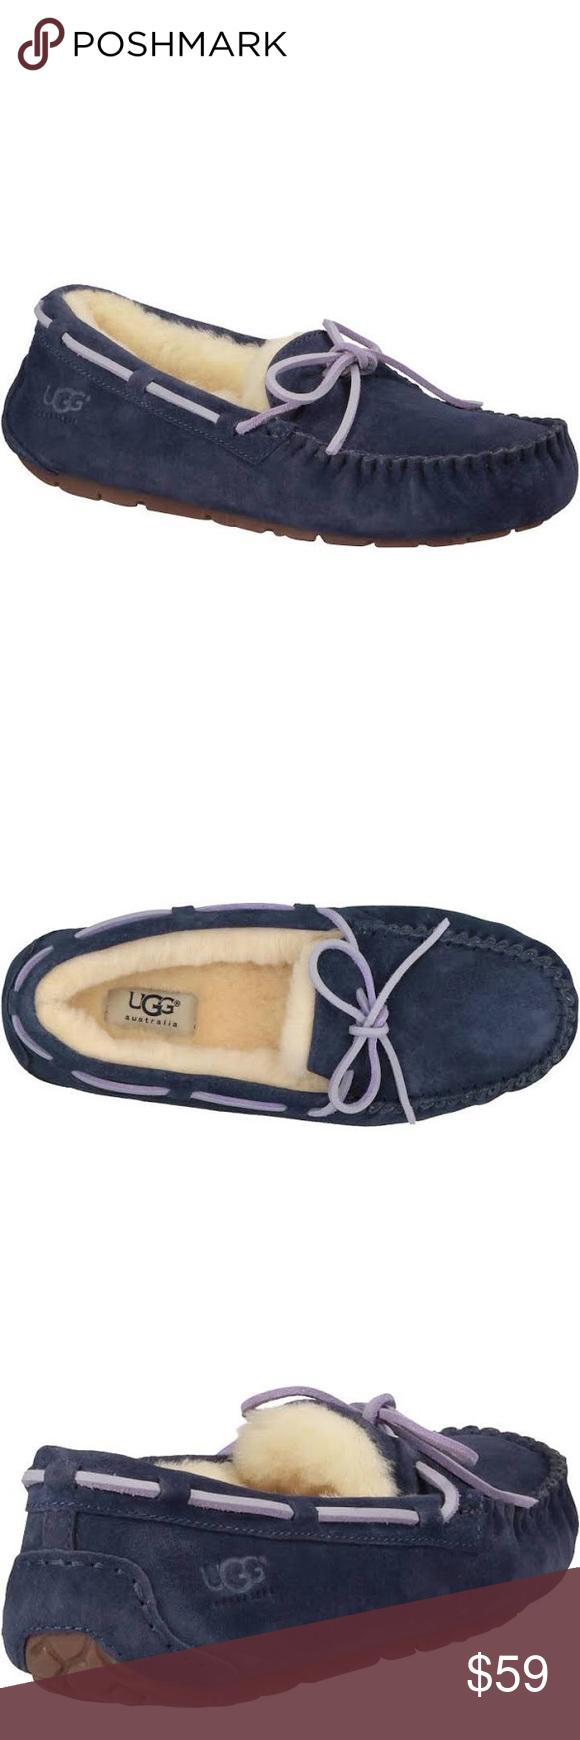 Ugg Dakota Navy Blue Slippers Womens 5